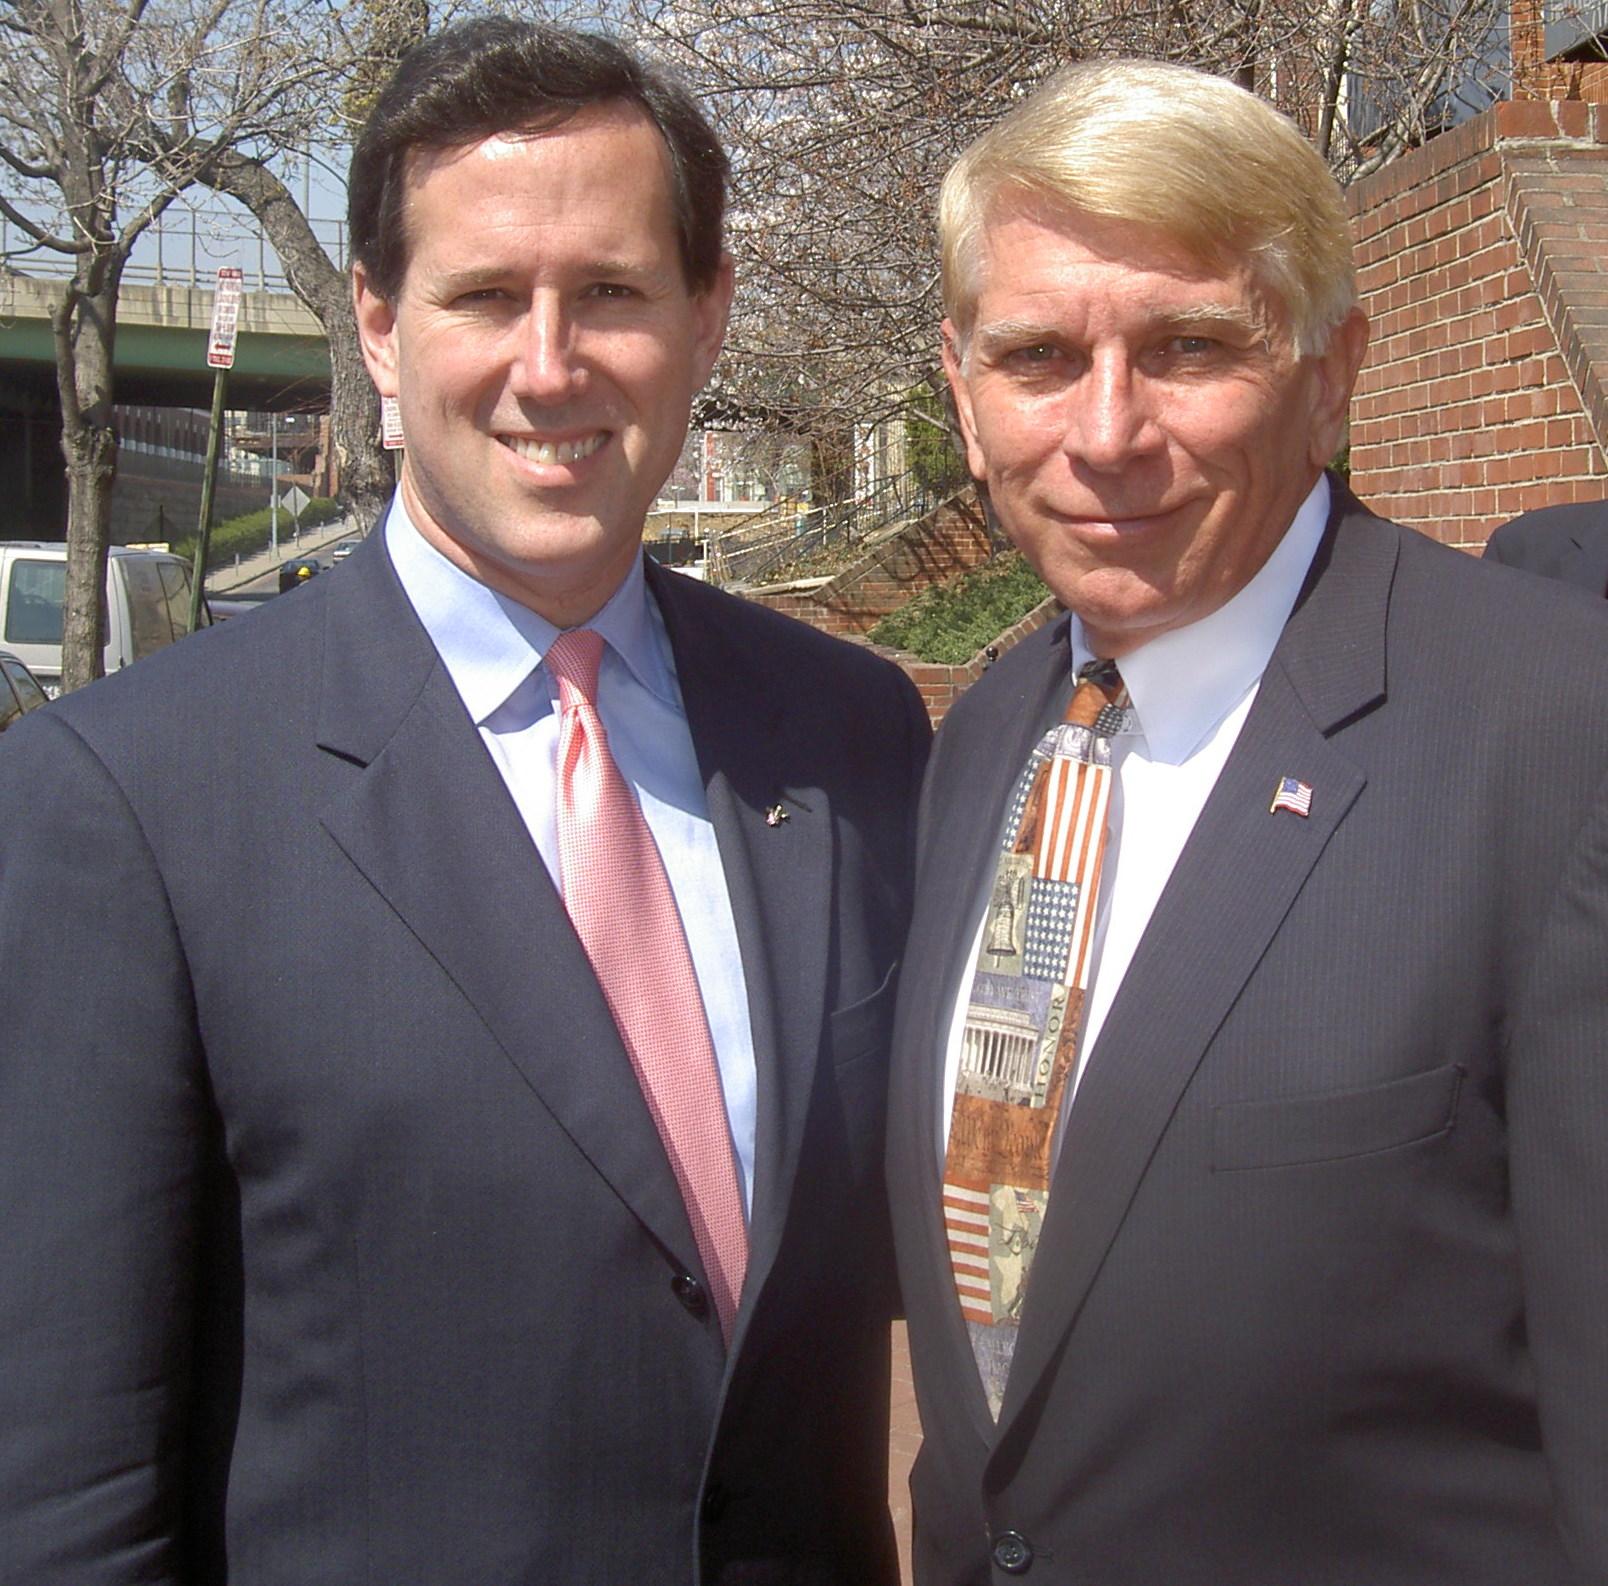 Rick Santorum and William J Murray